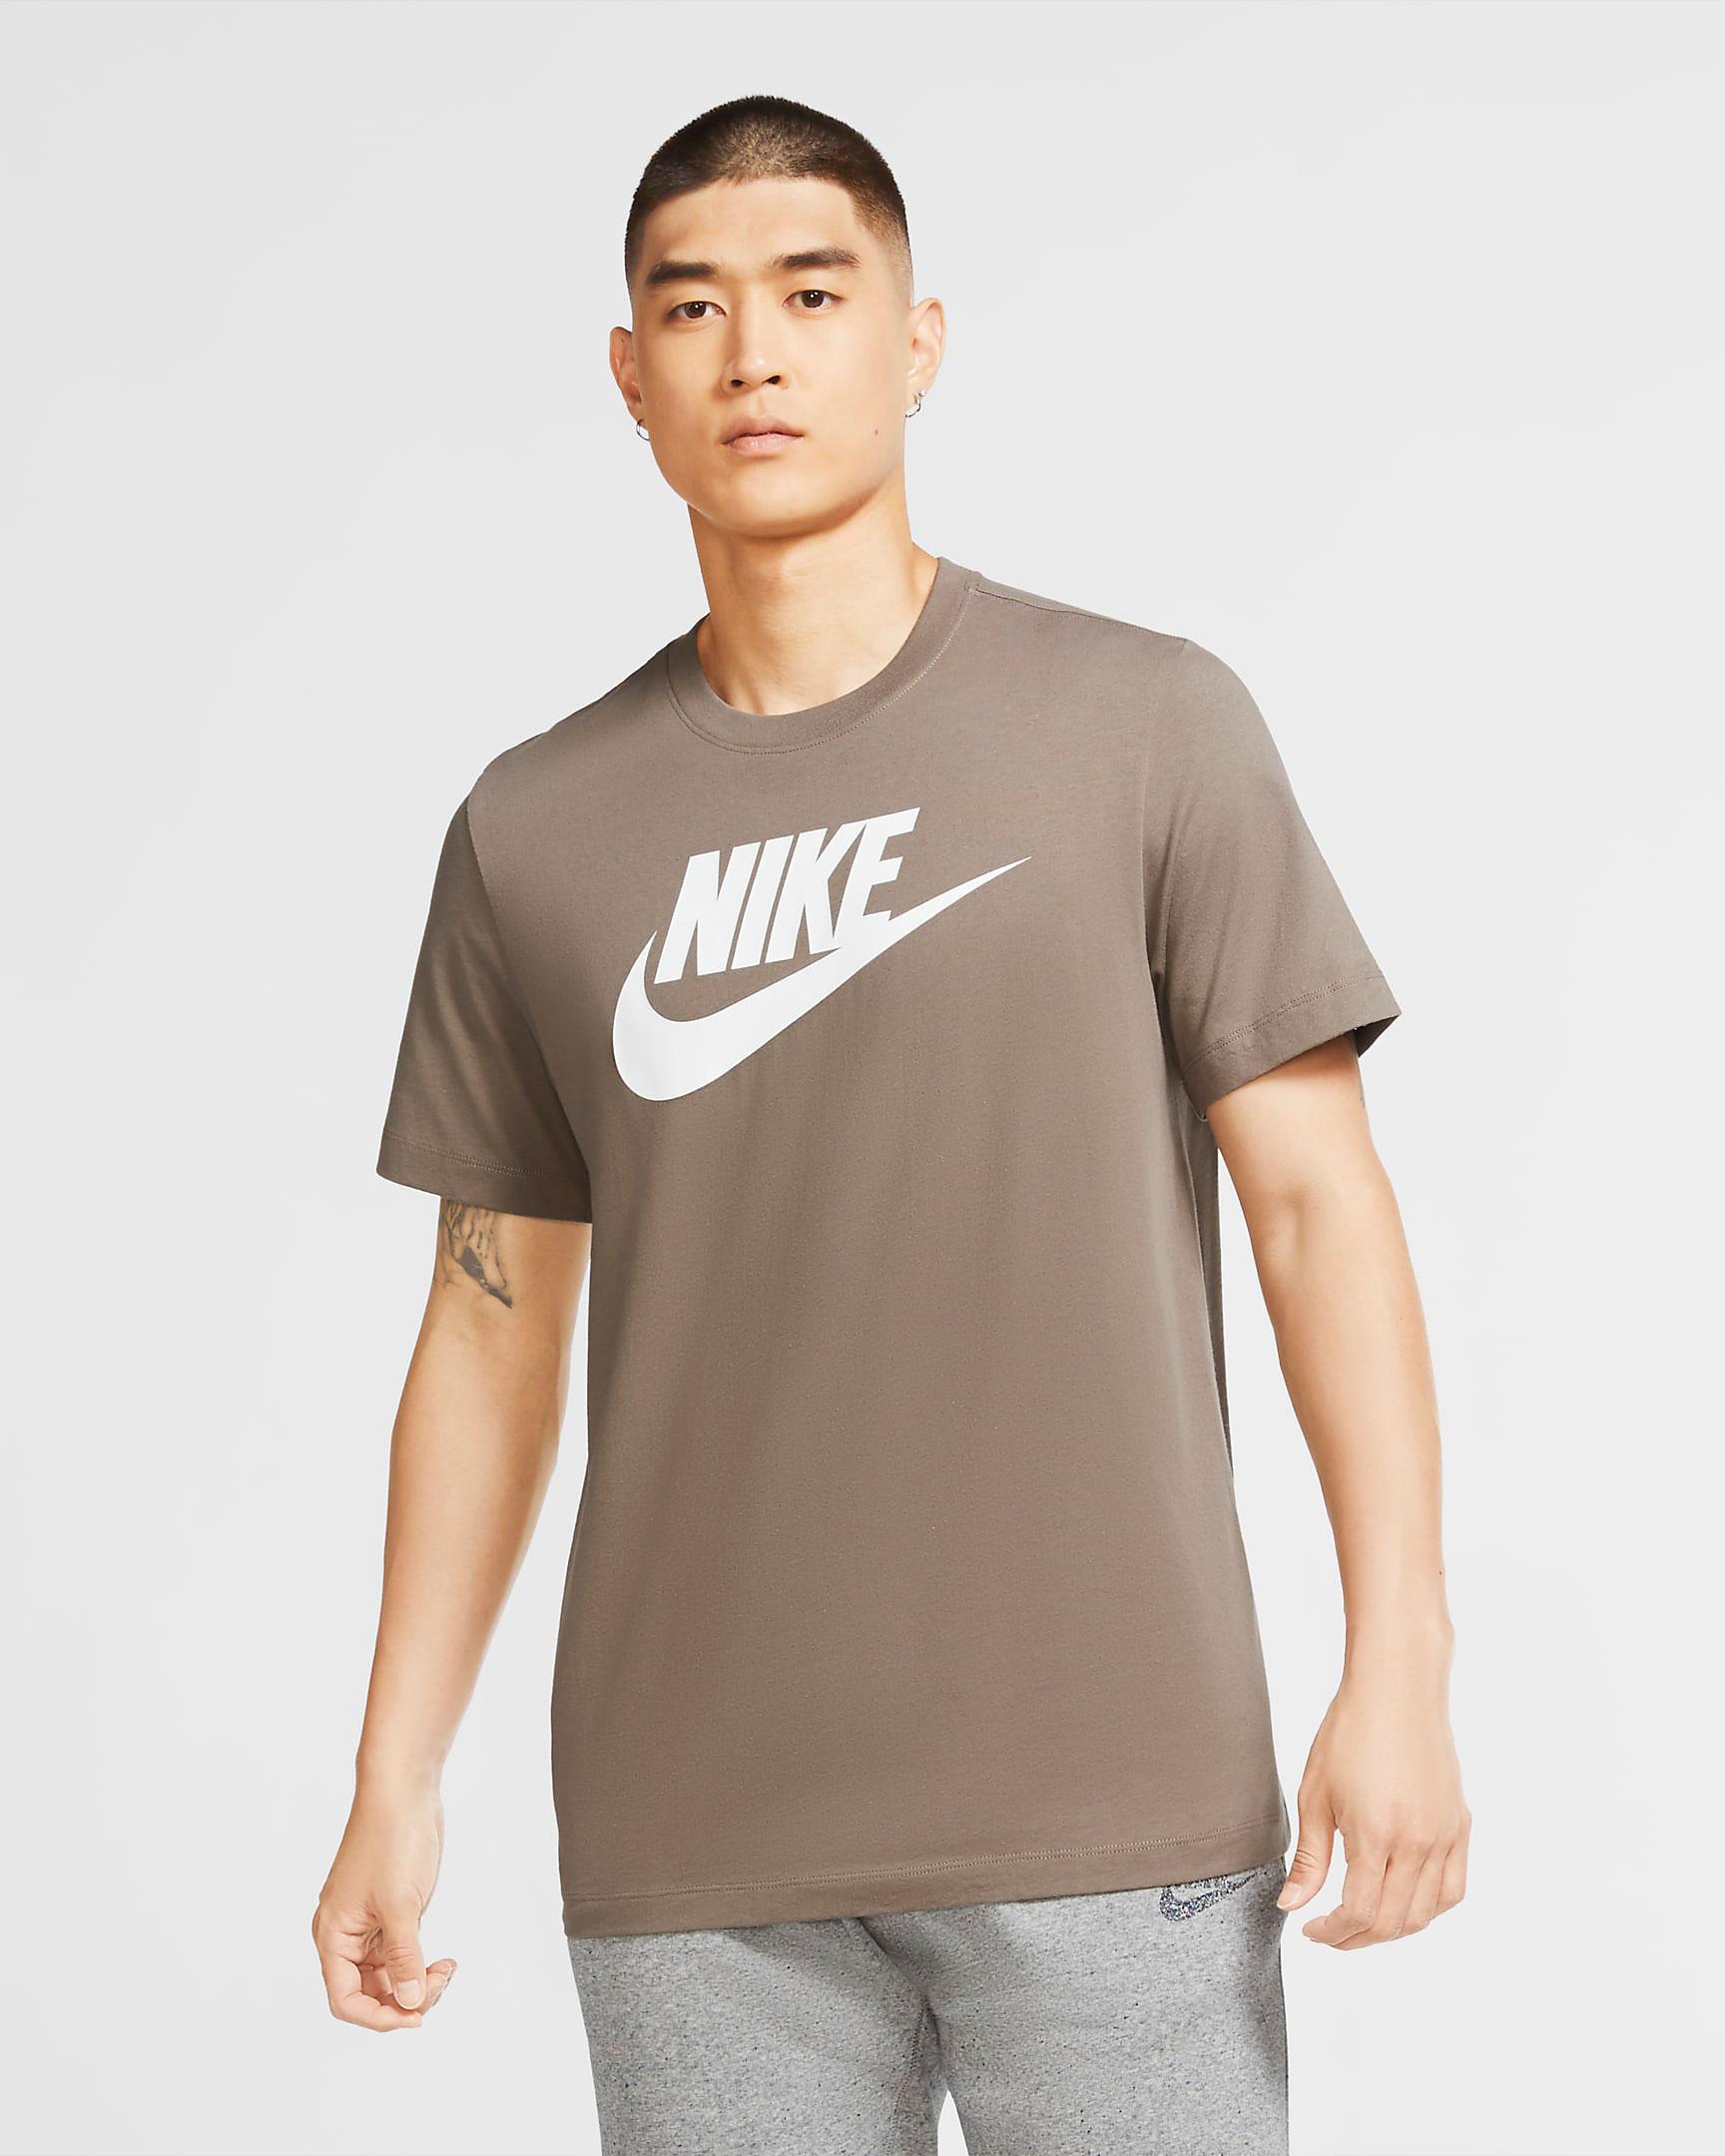 air-jordan-1-dark-mocha-nike-tee-shirt-match